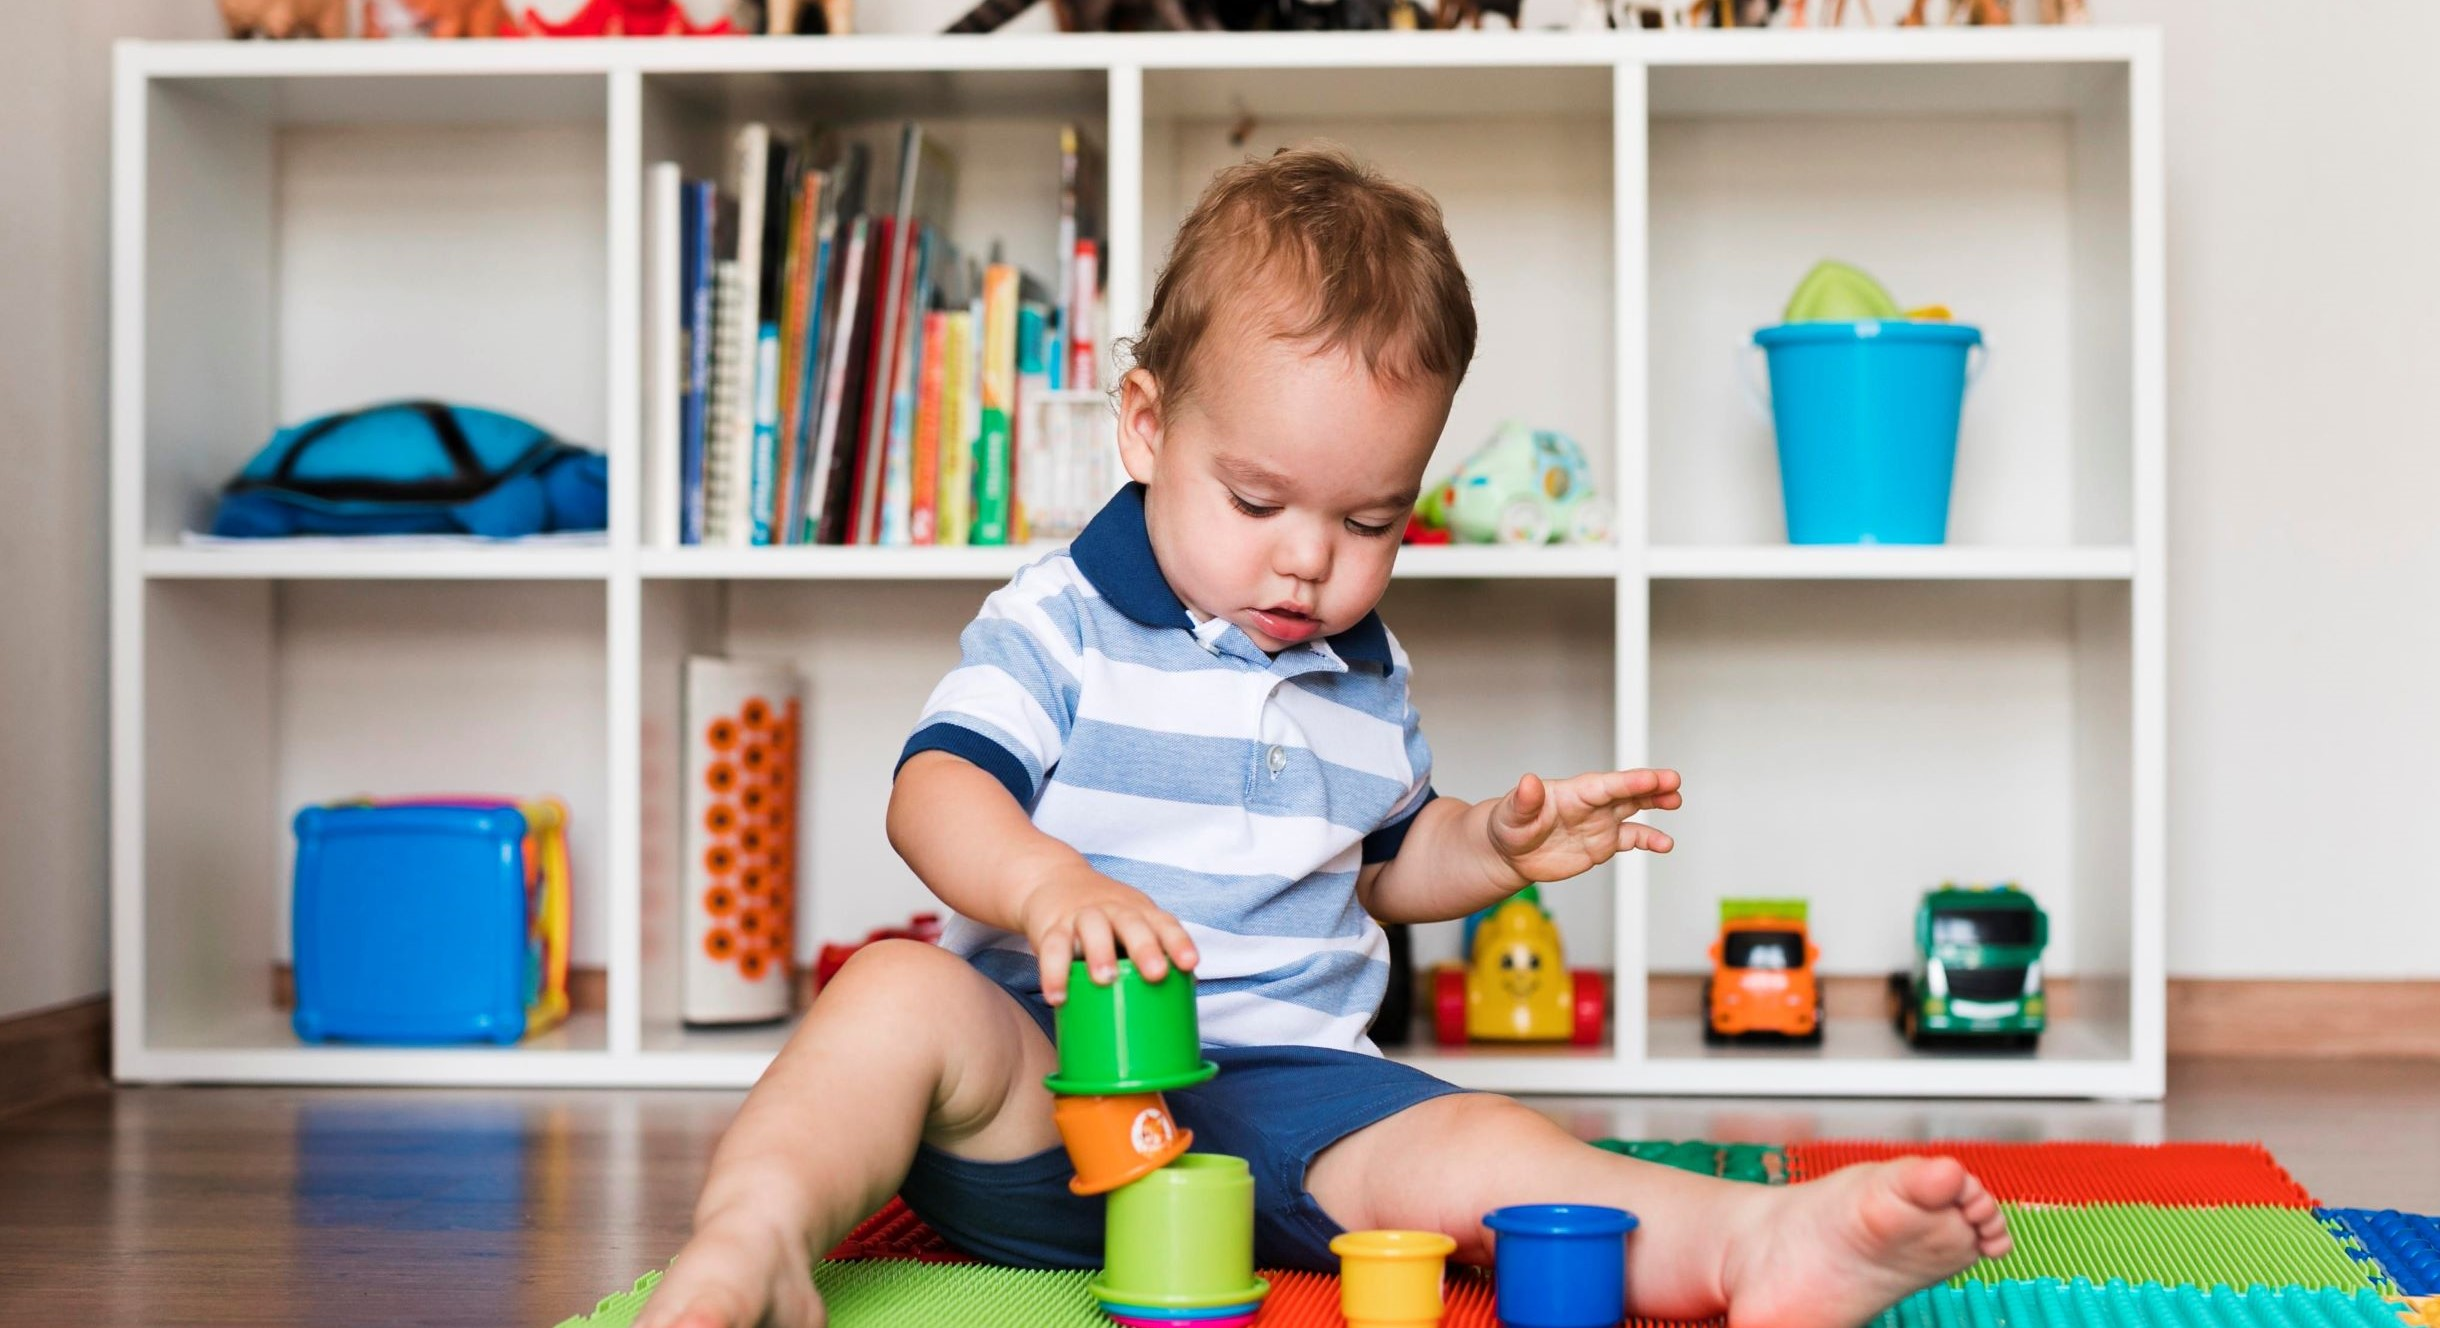 монтесори, организация на средата, детска стая, детско развитие, игри, психолог, логопед